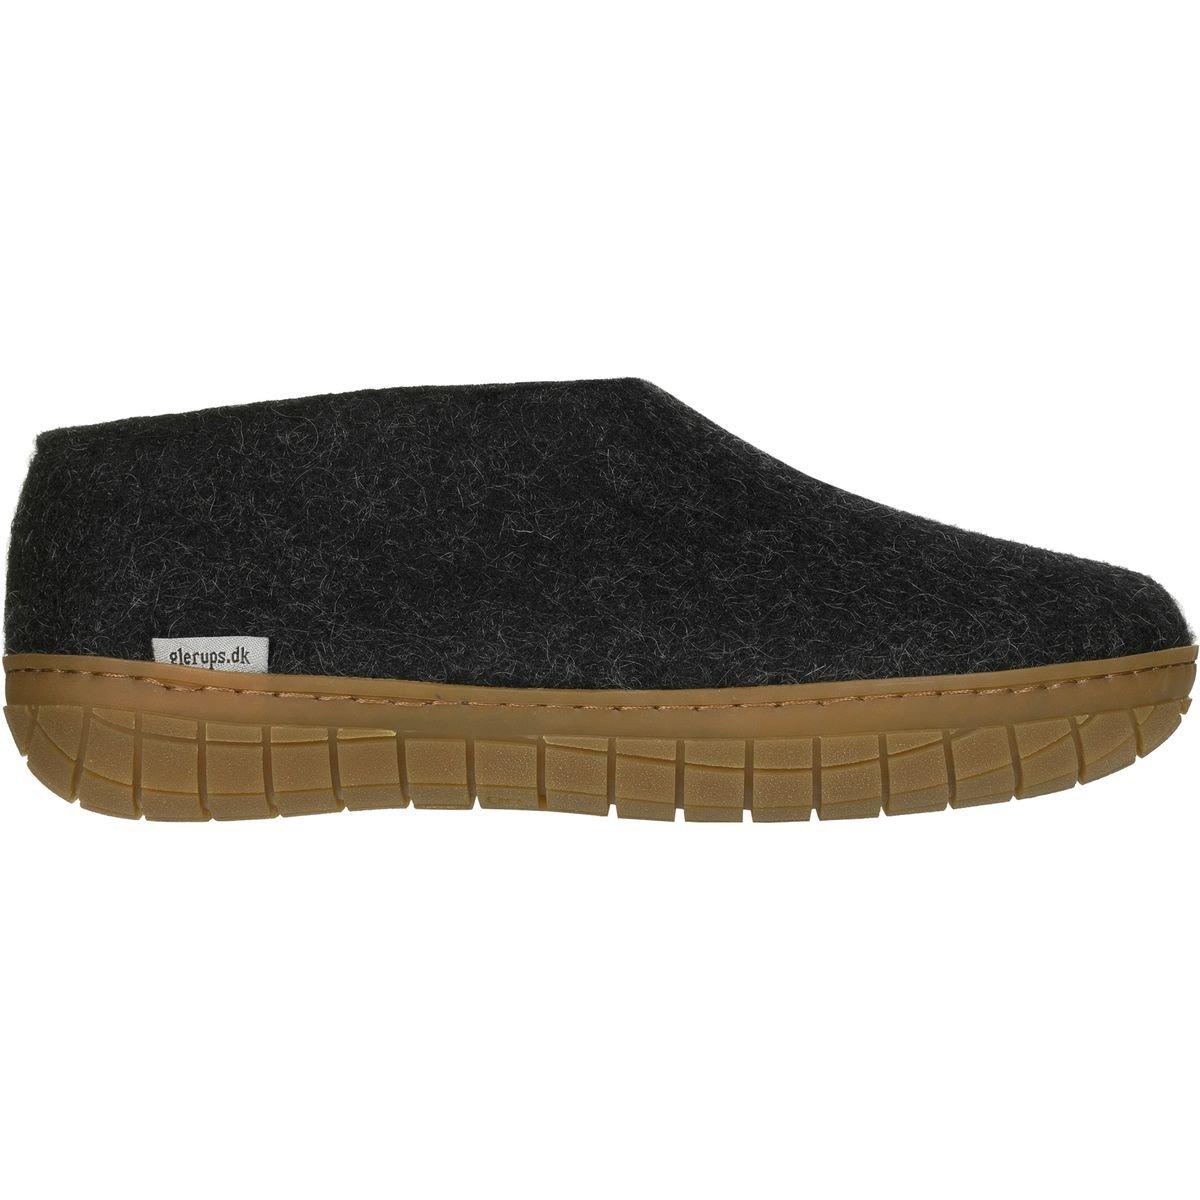 Glerups AR Rubber Shoe Charcoal, 44.0